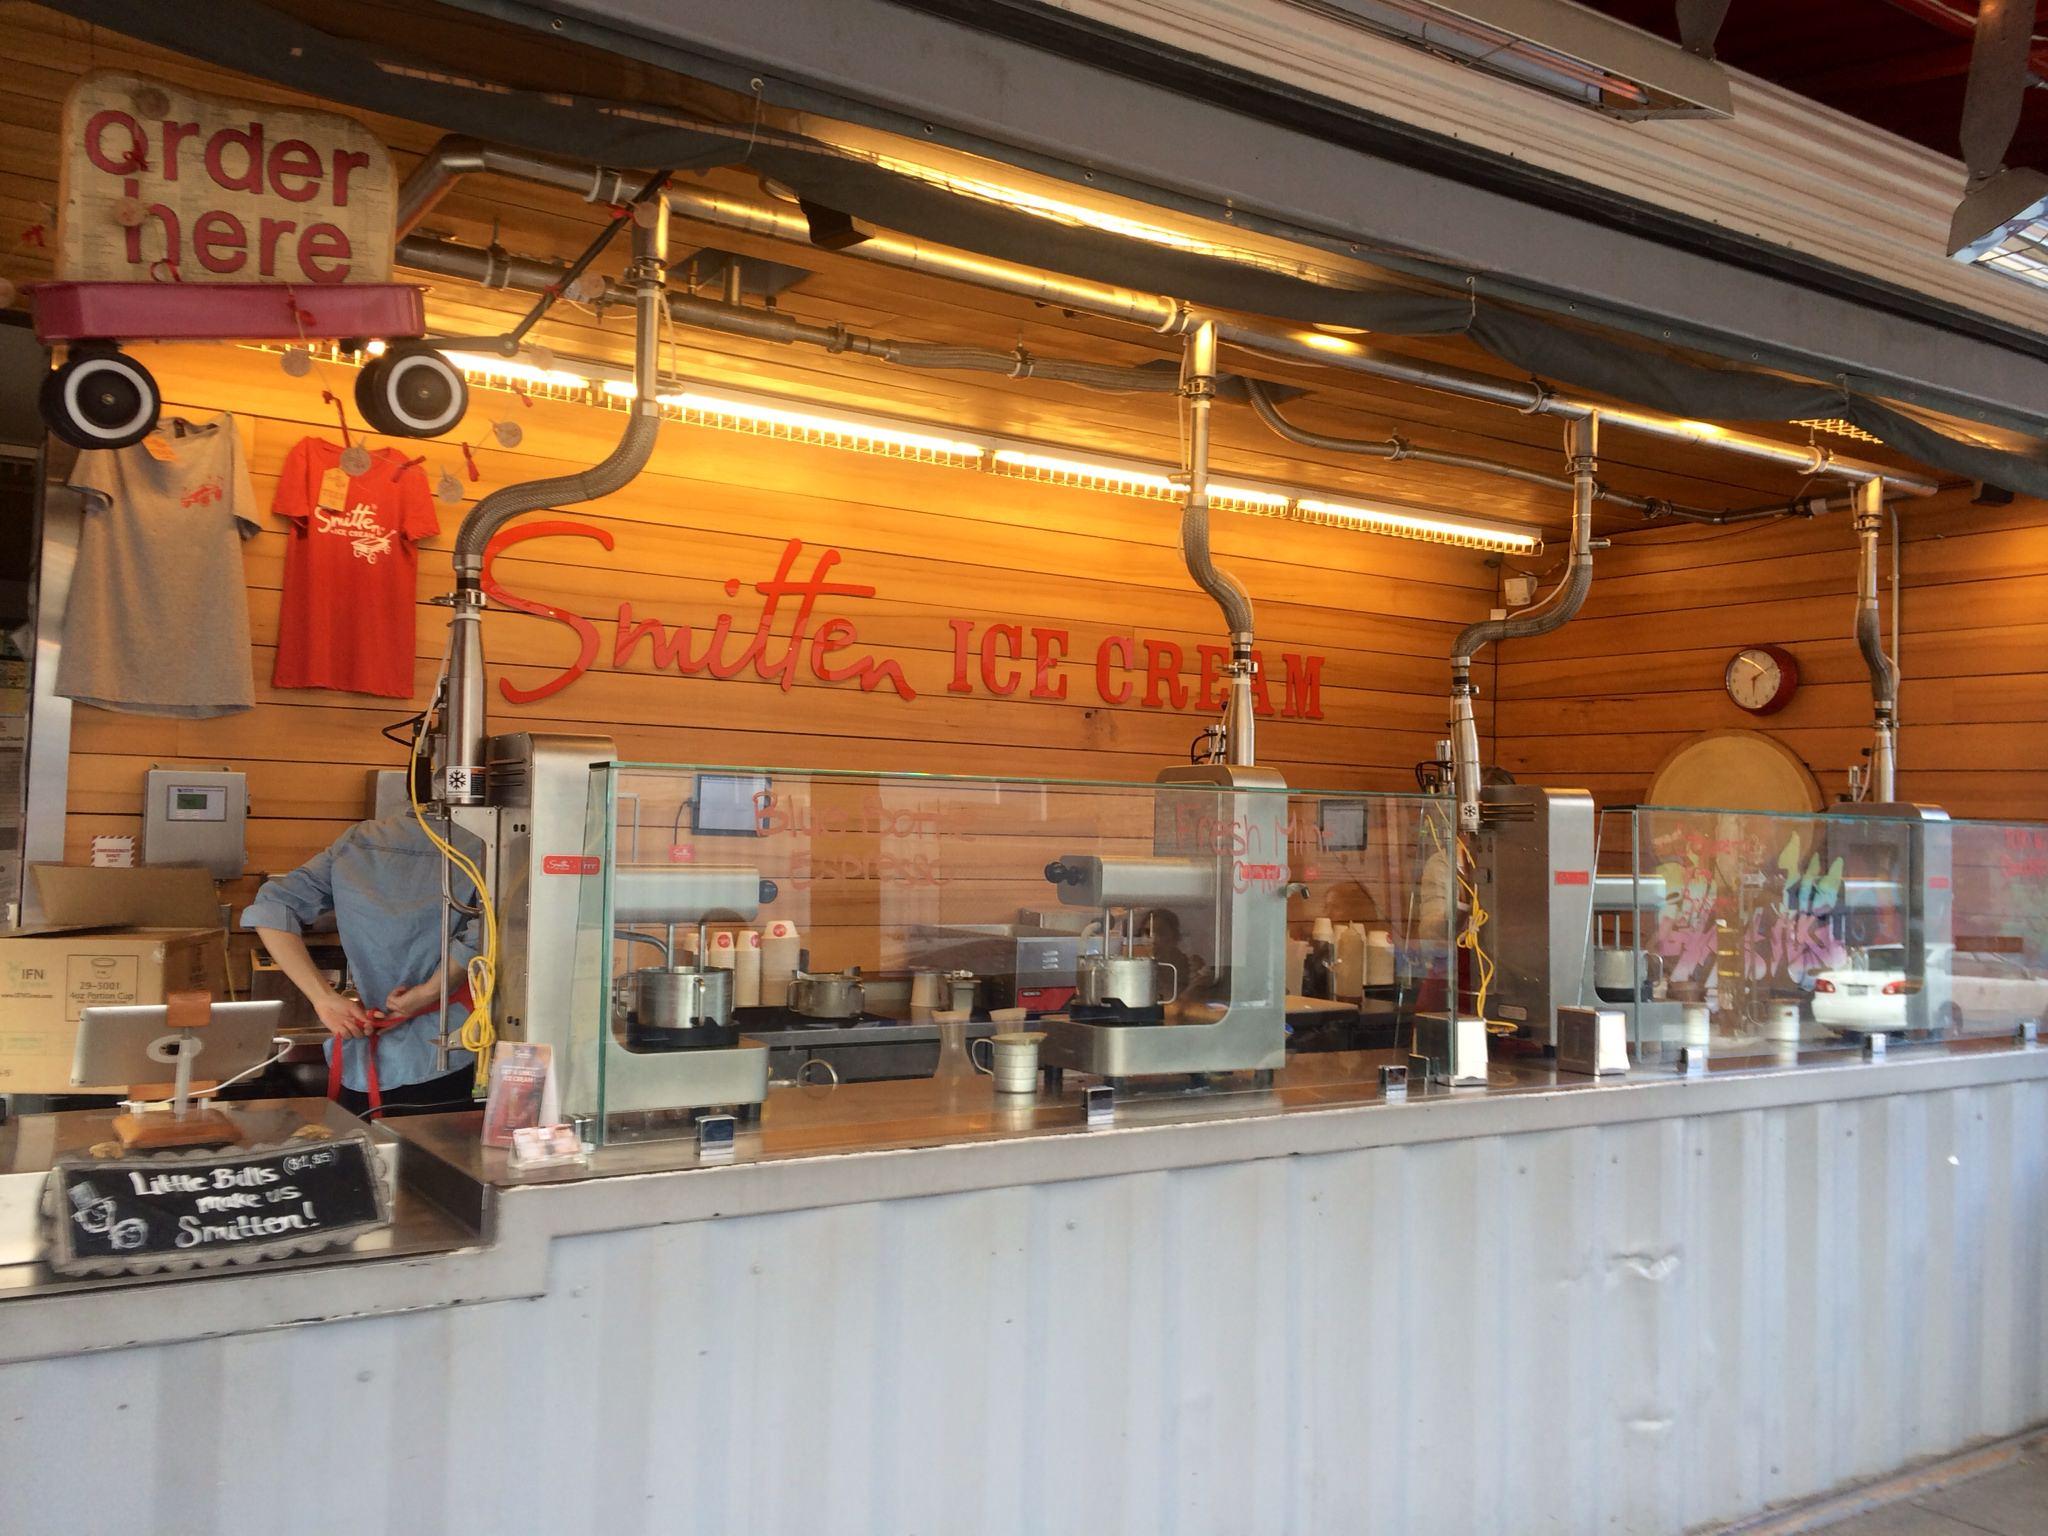 Smitten Ice Cream shop in Hayes Valley